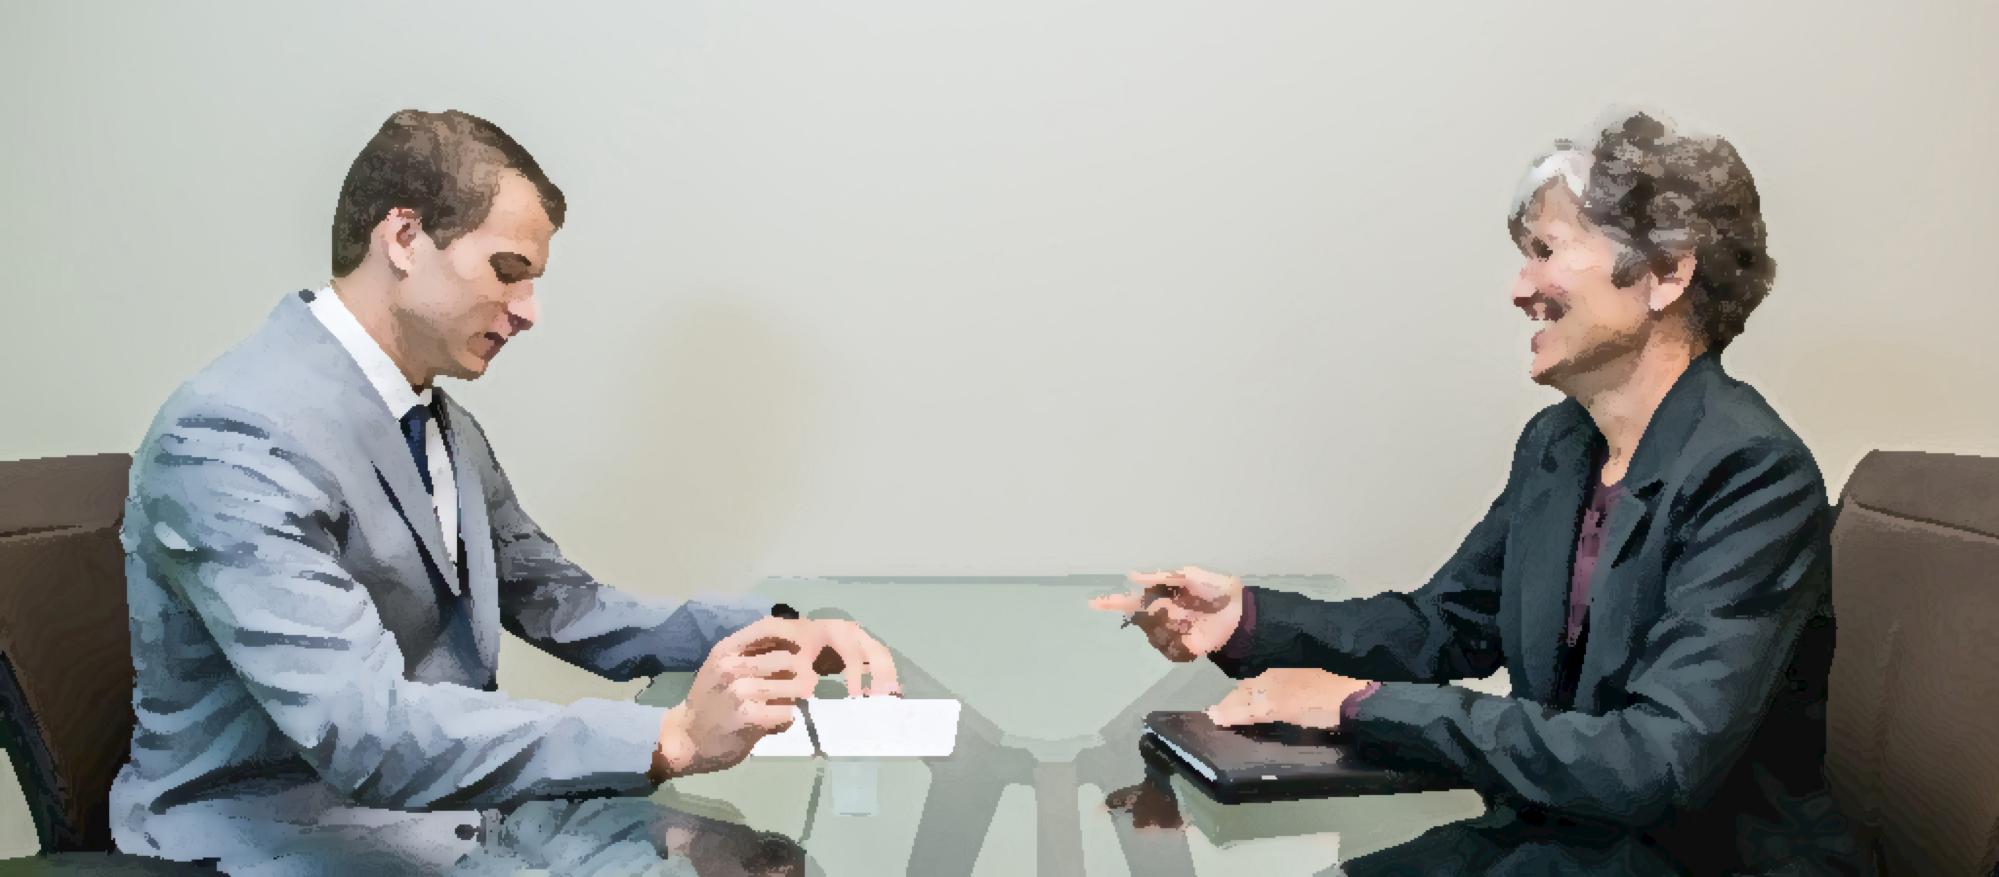 hiring-devops-talent-interviewing